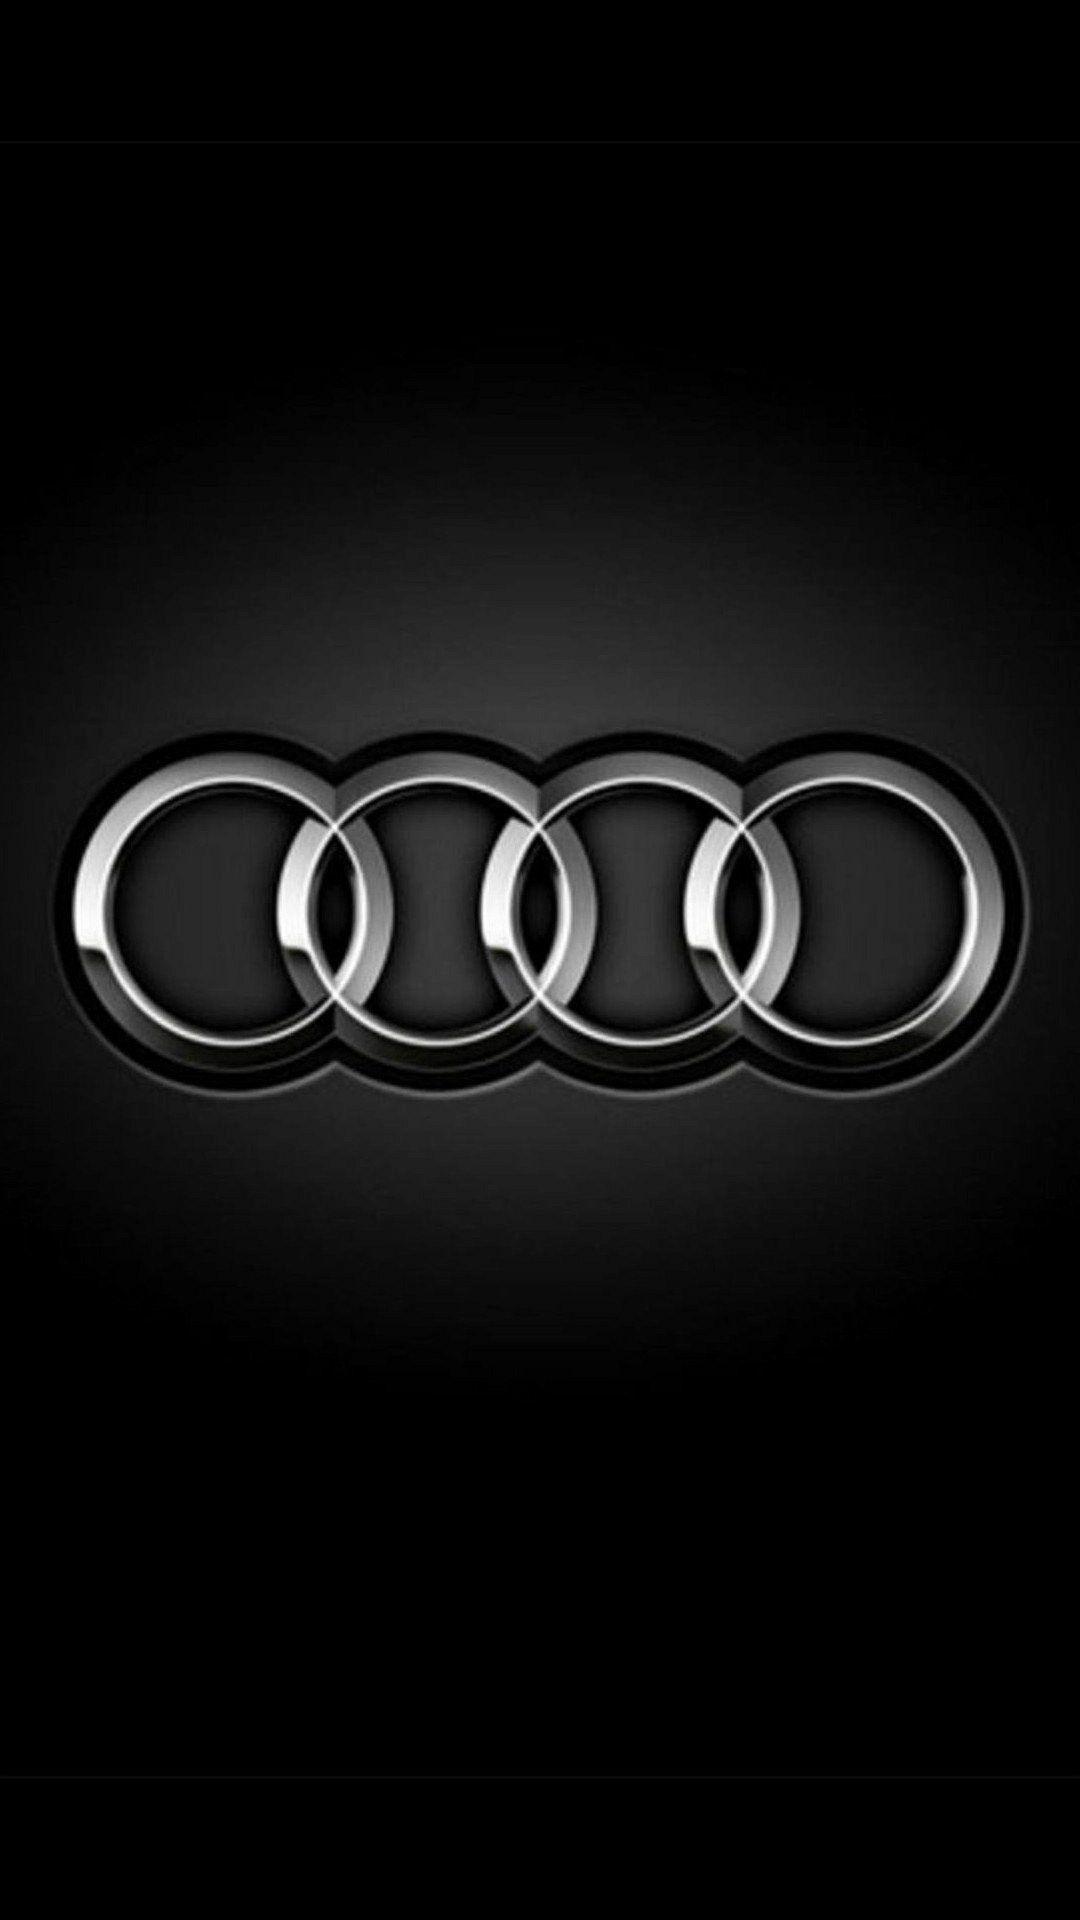 Logo Android Wallpaper Imagens De Carros Ingolstadt Wallpaper S8